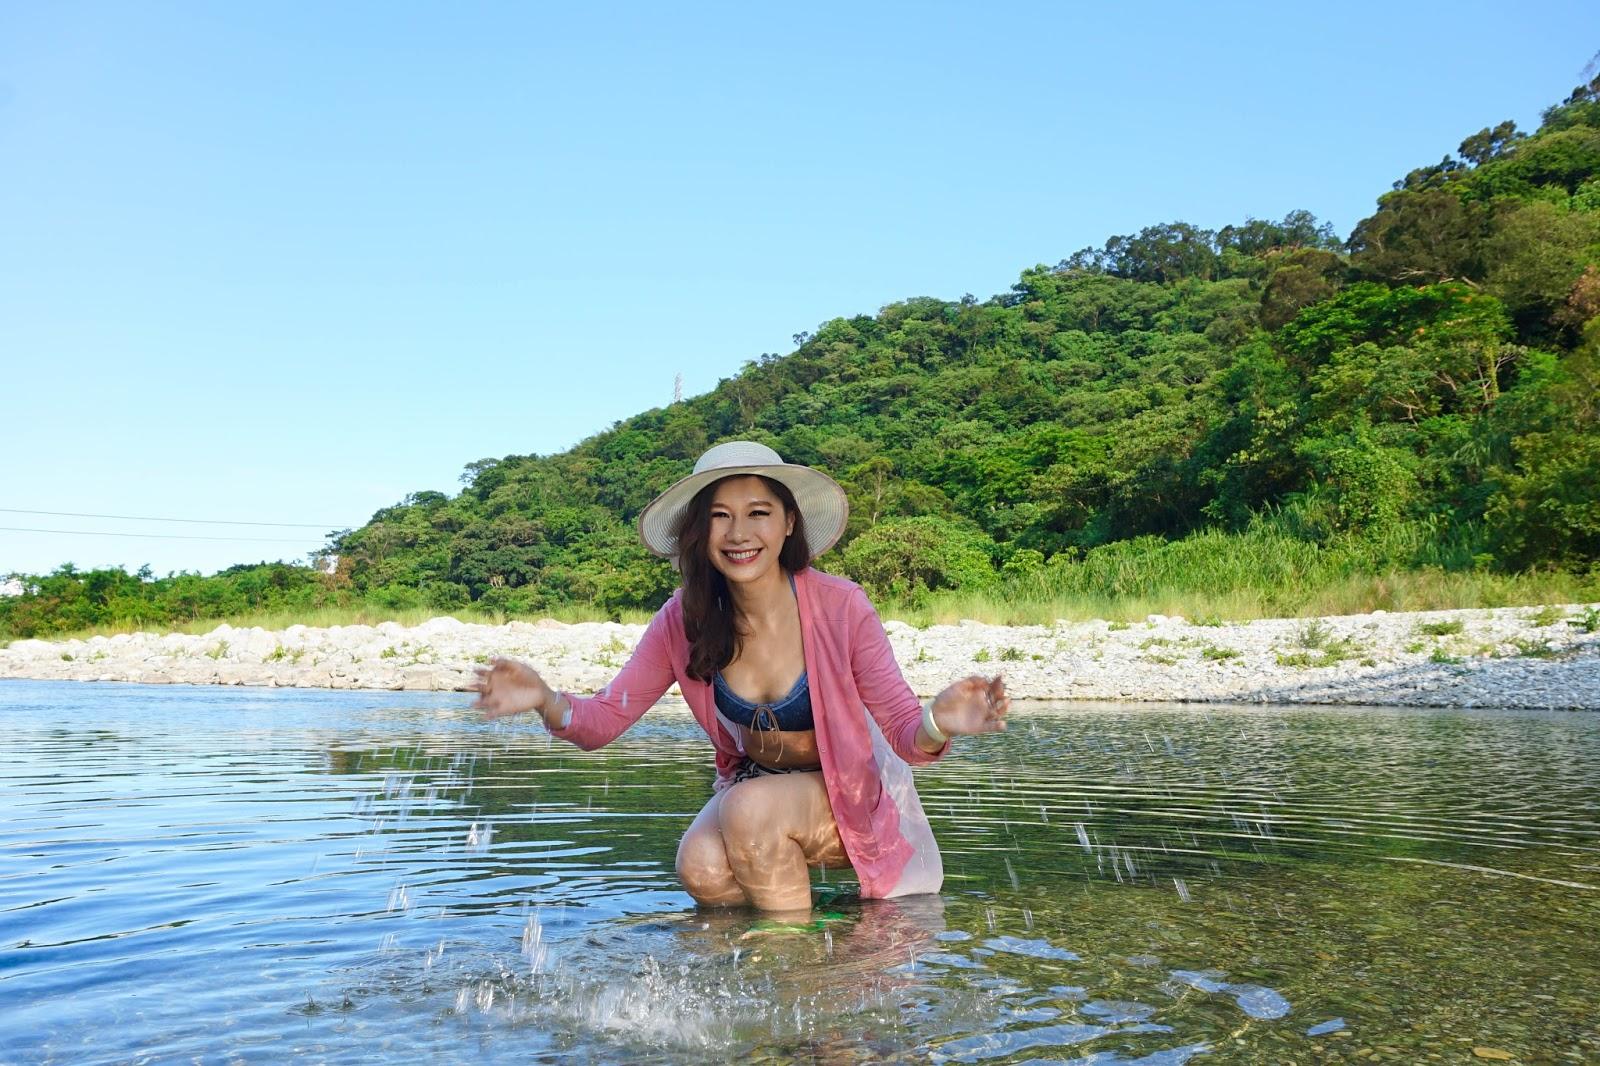 2-%25E6%259C%25AA%25E5%2591%25BD%25E5%2590%258D-IMG_2010-beautyanxiety.com-hualien-travel-sanzhan-river